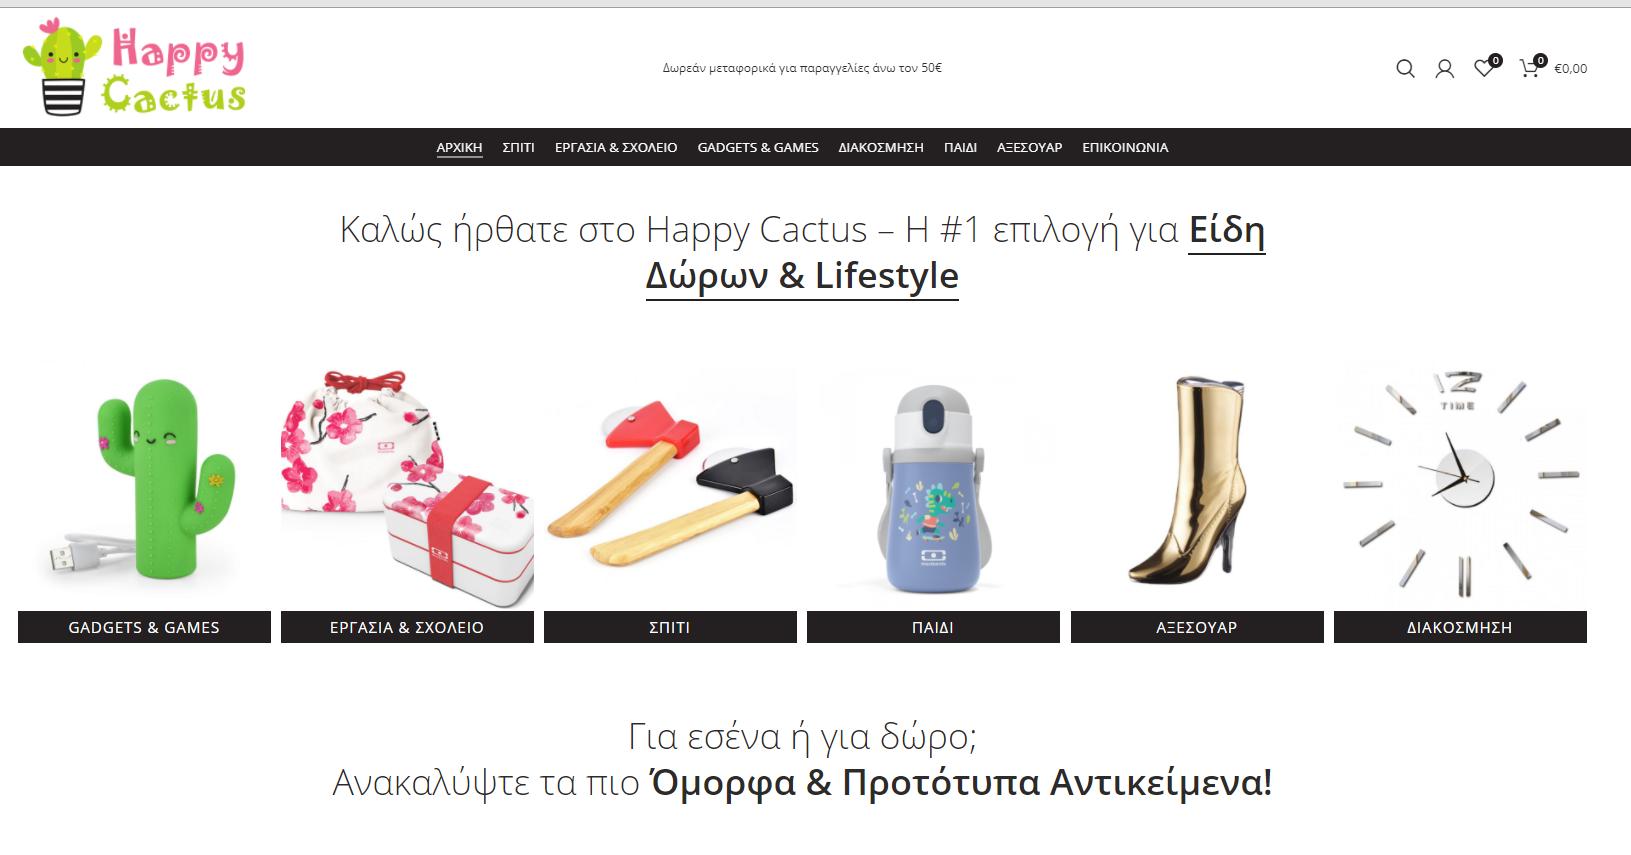 header homepage kataskeuis eshop se woocomerce - Κατασκευή eshop Happy Cactus - 3site